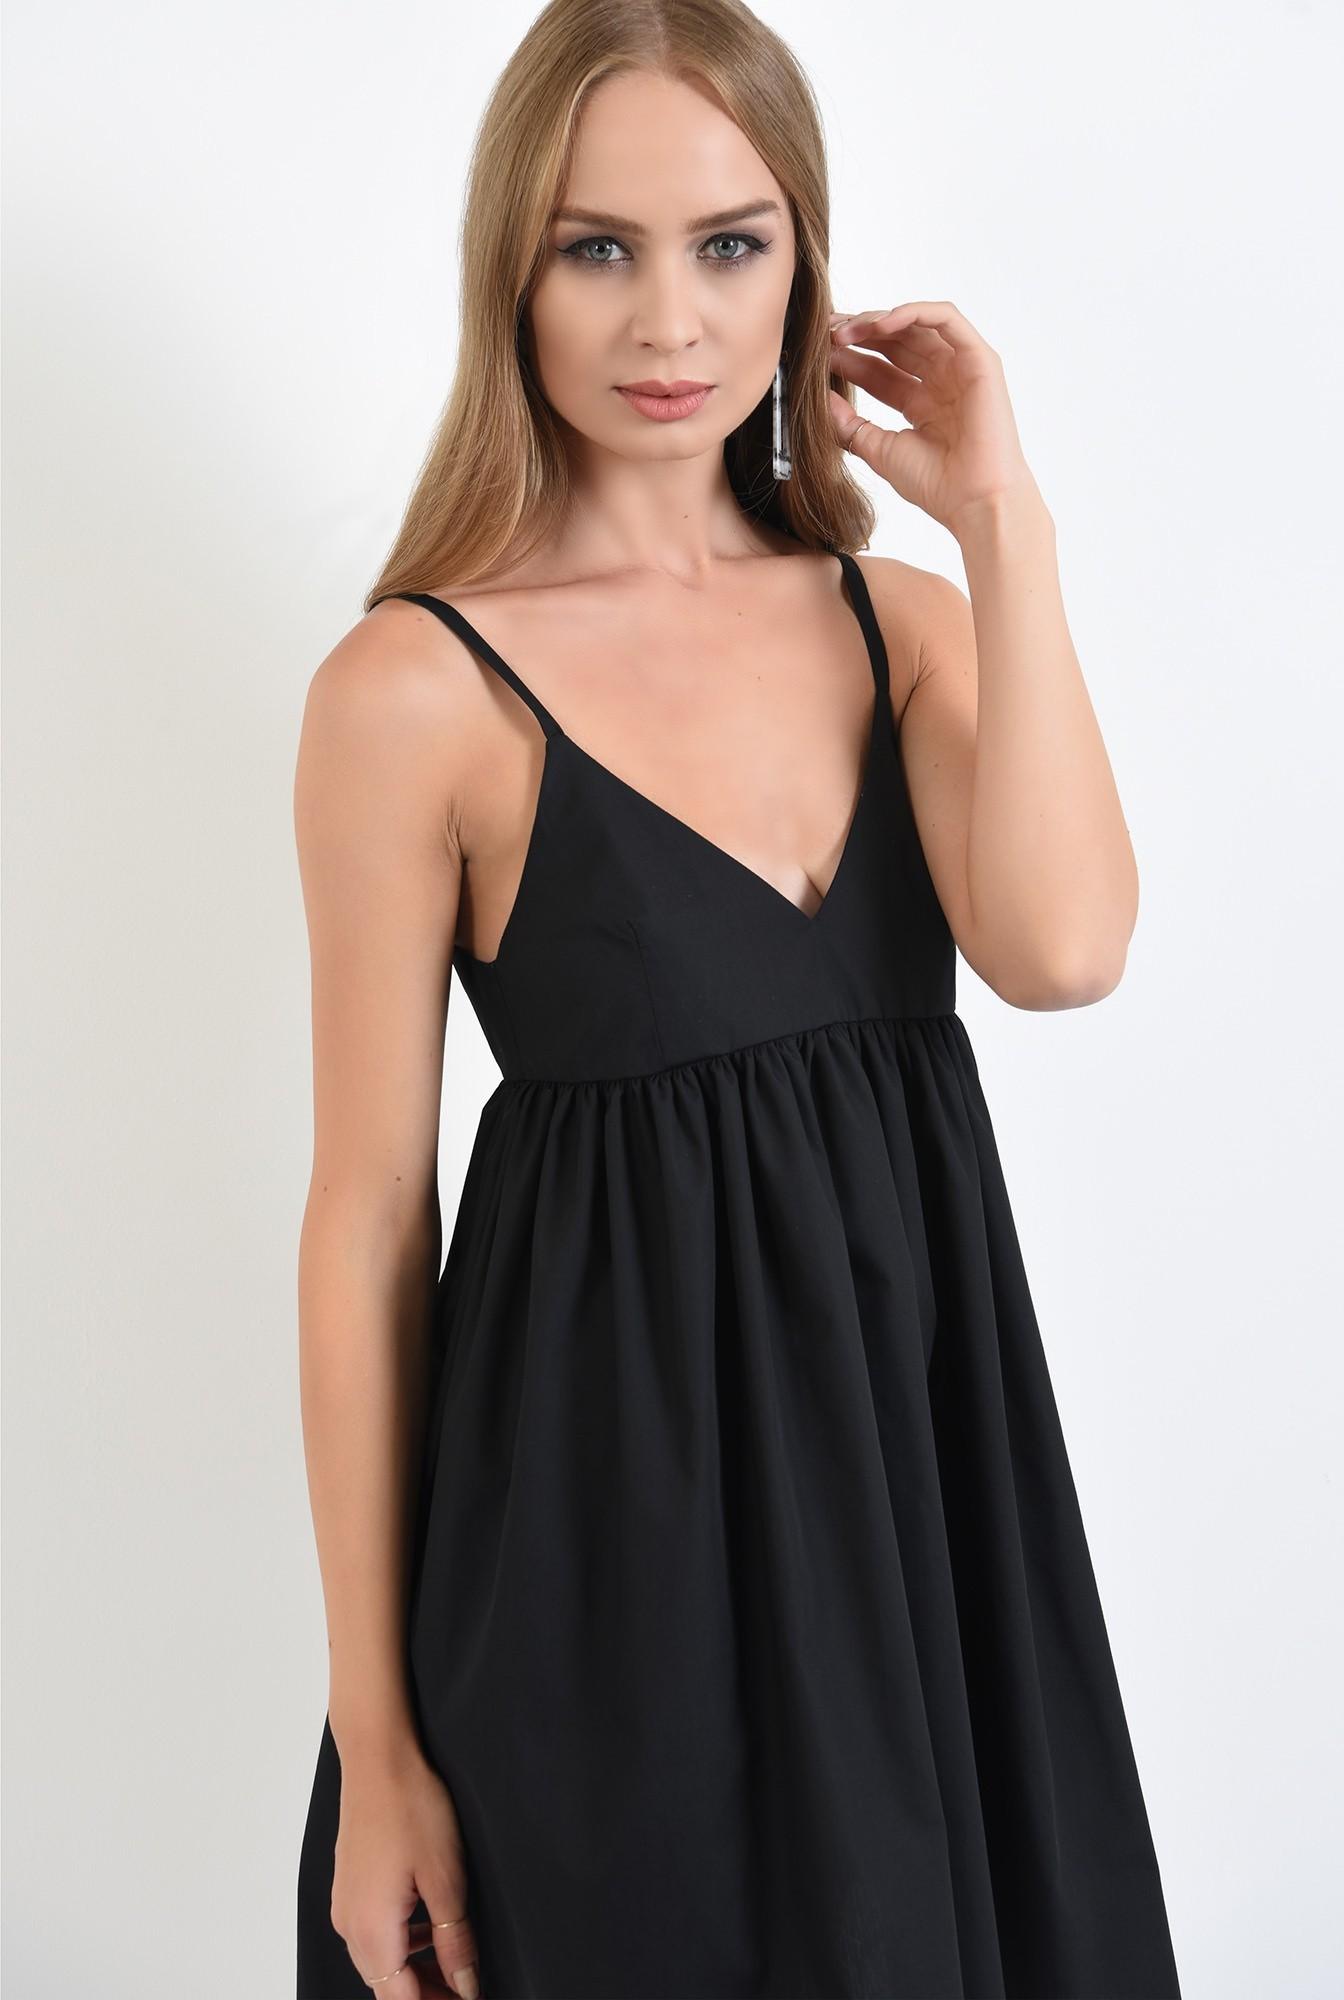 2 - 360 - rochie neagra, mini, evazata, cu bretele, anchior